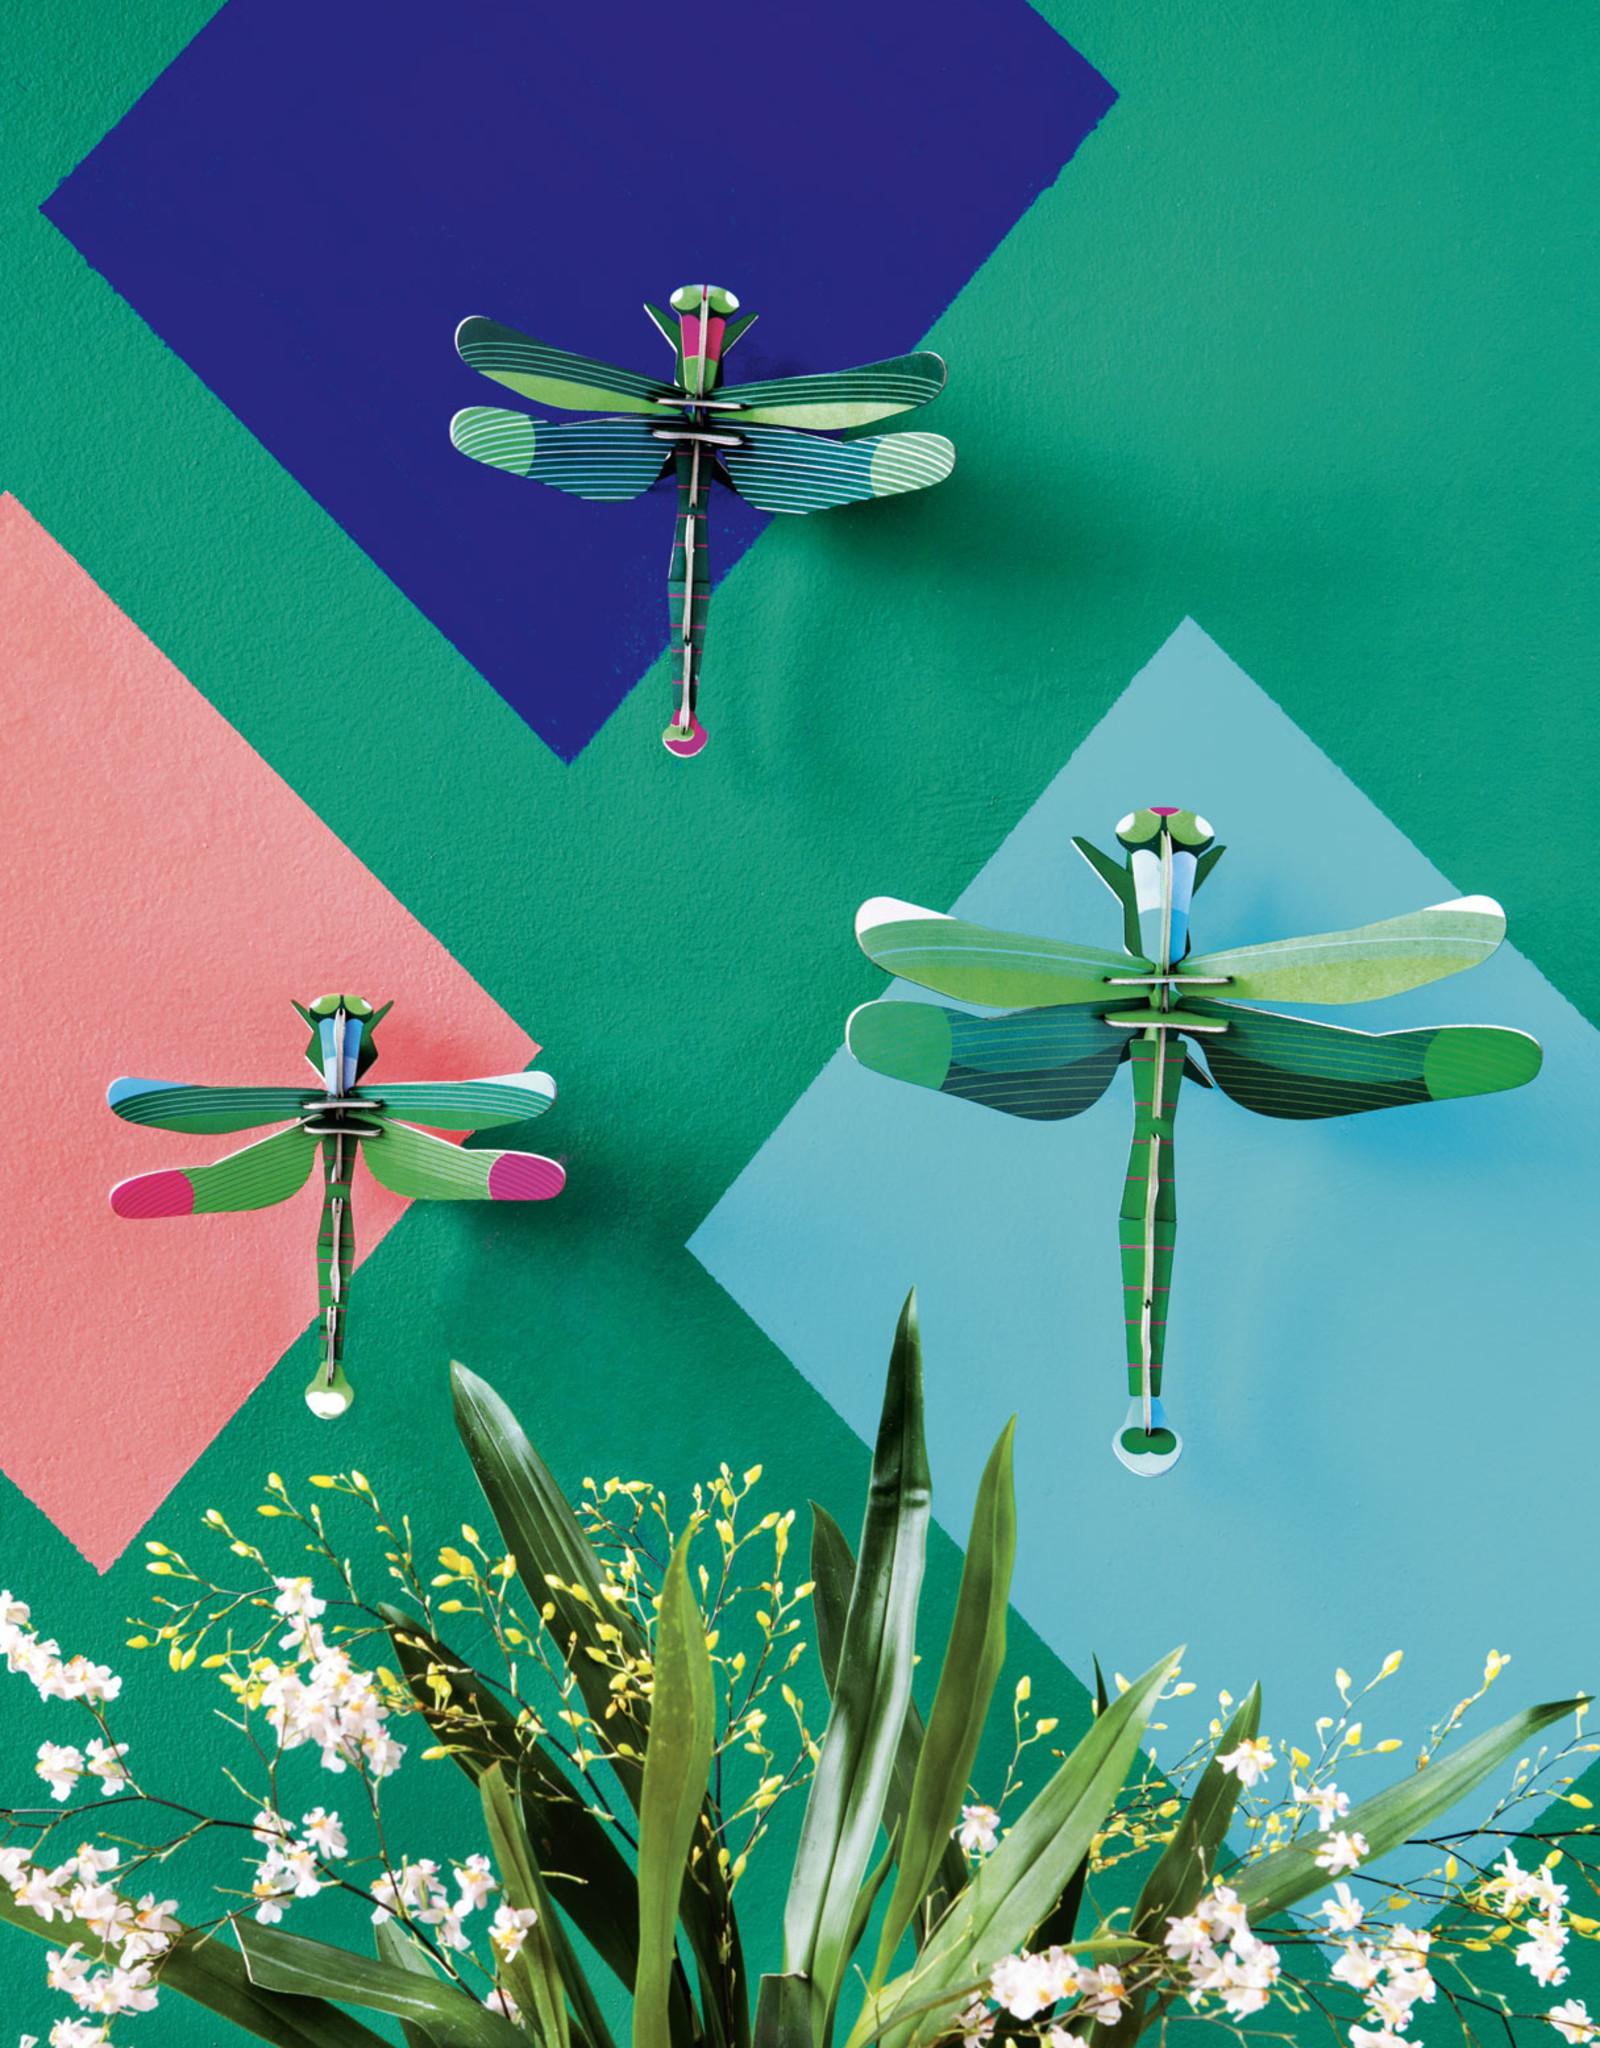 Studioroof Wall Decor Dragonflies (set of 3)